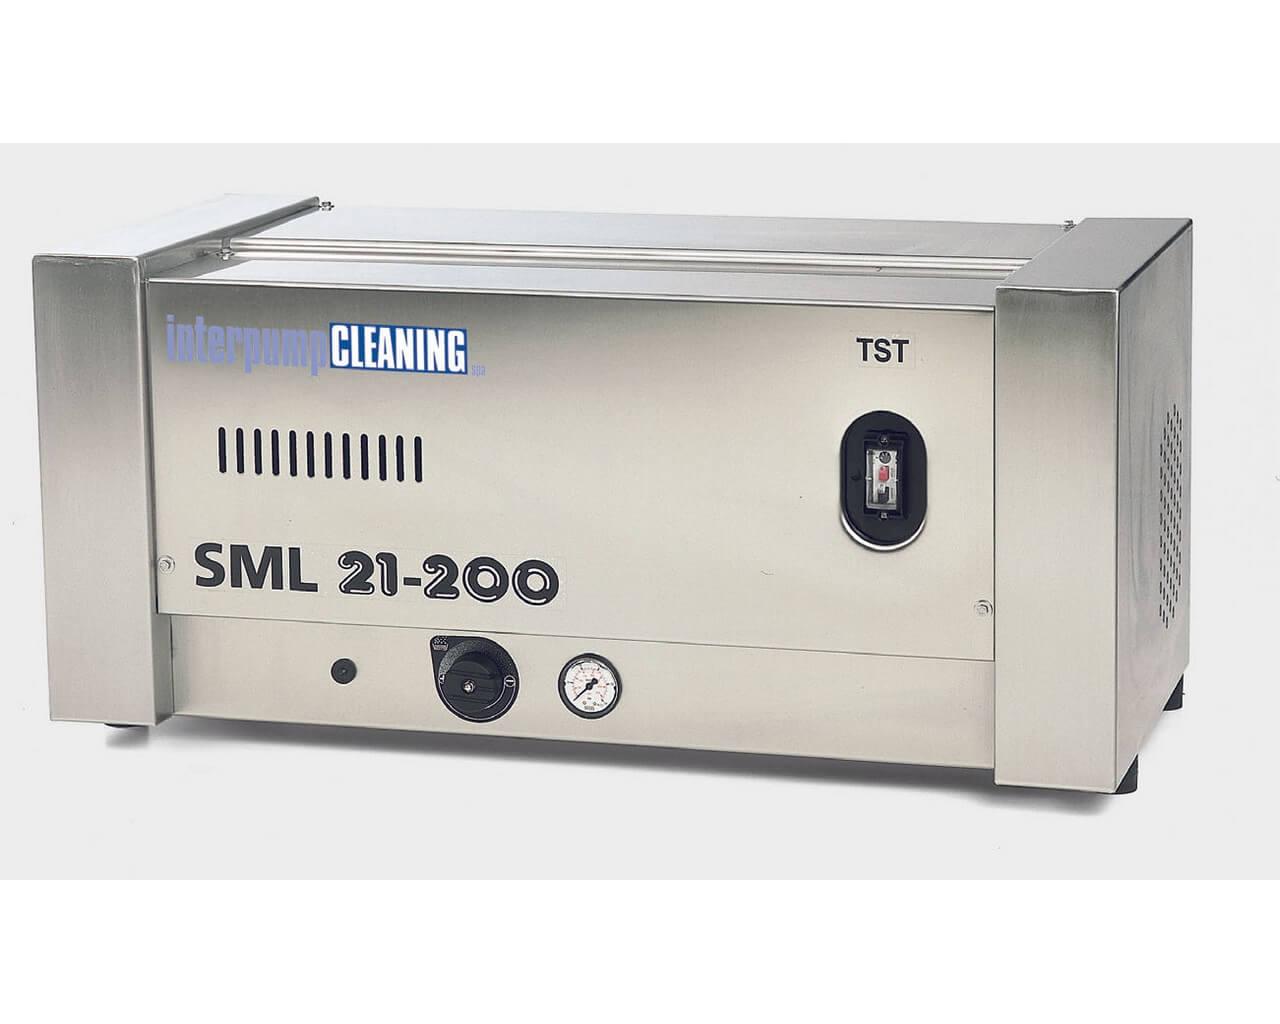 CLEN SML 21.200 RST - Kailatec Oy Verkkokauppa